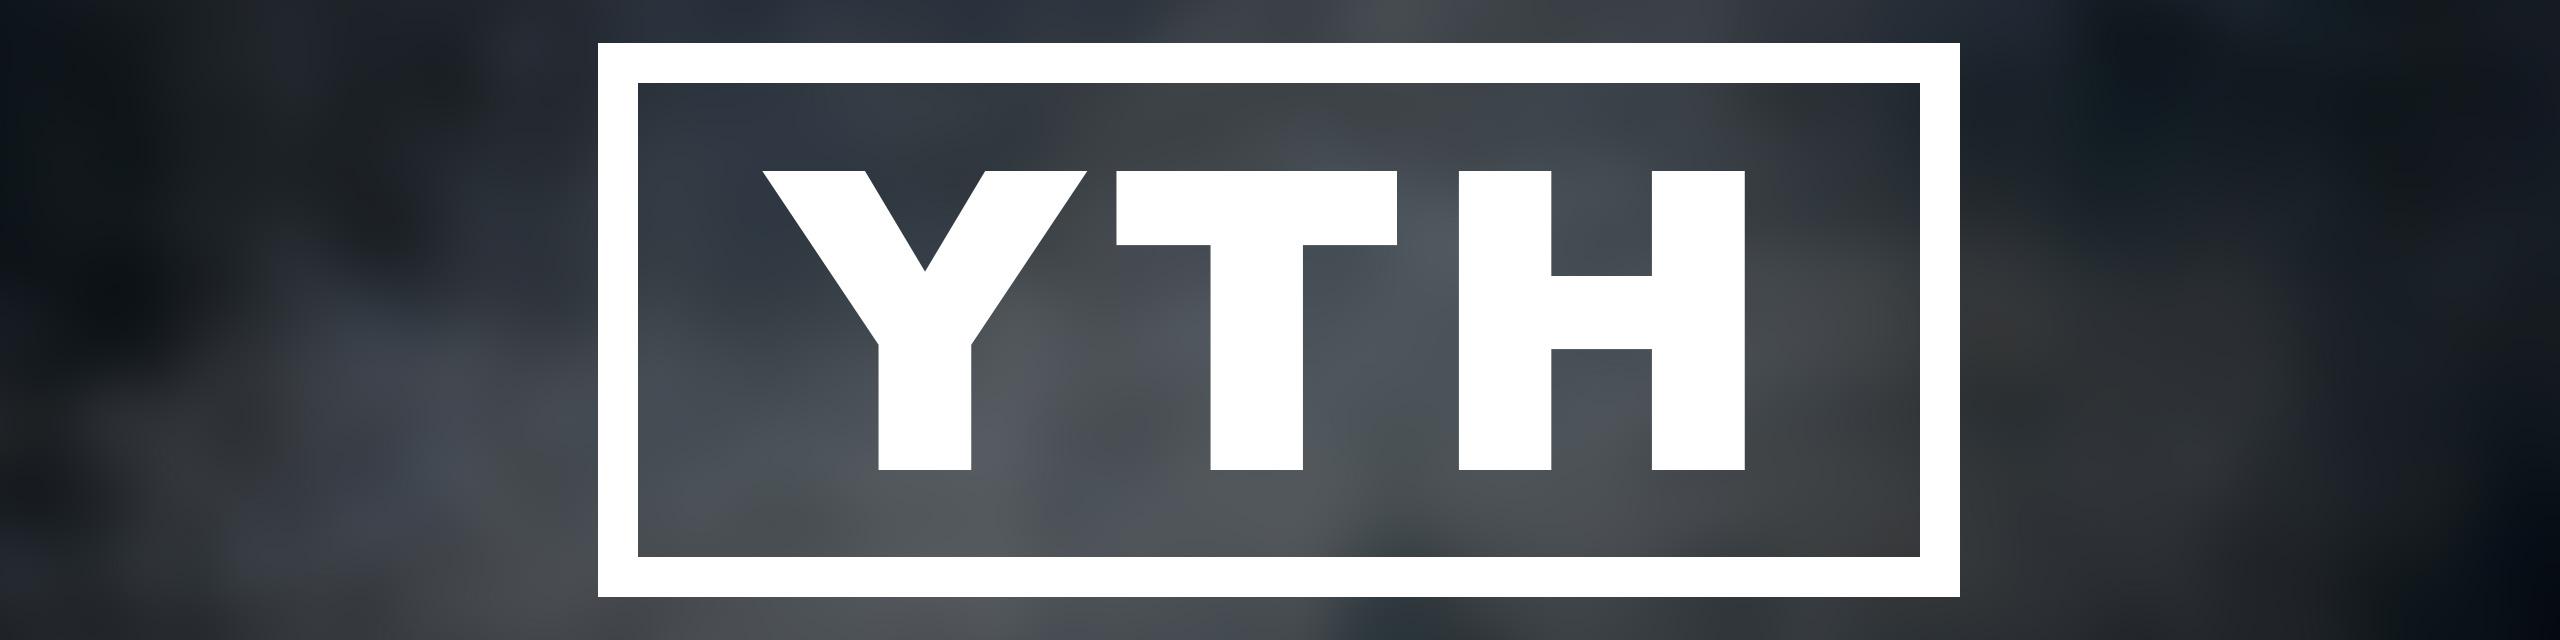 Youth Header